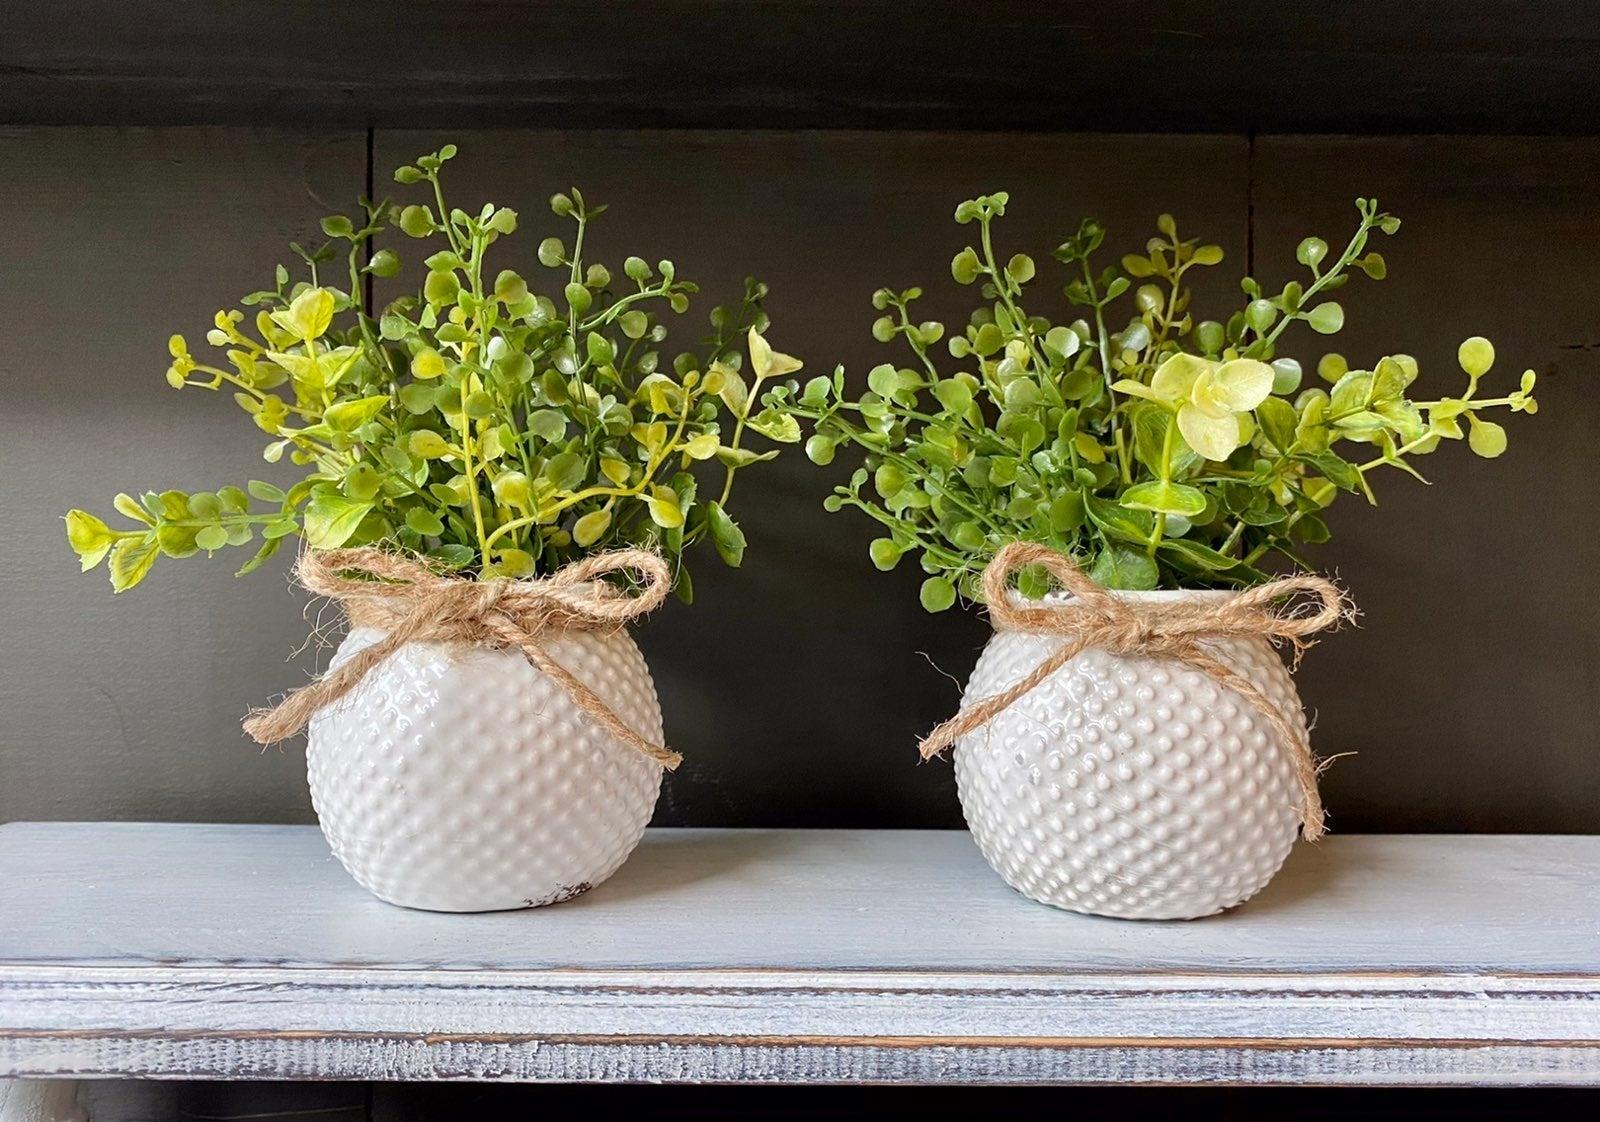 Mini Farmhouse Greenery Arrangements